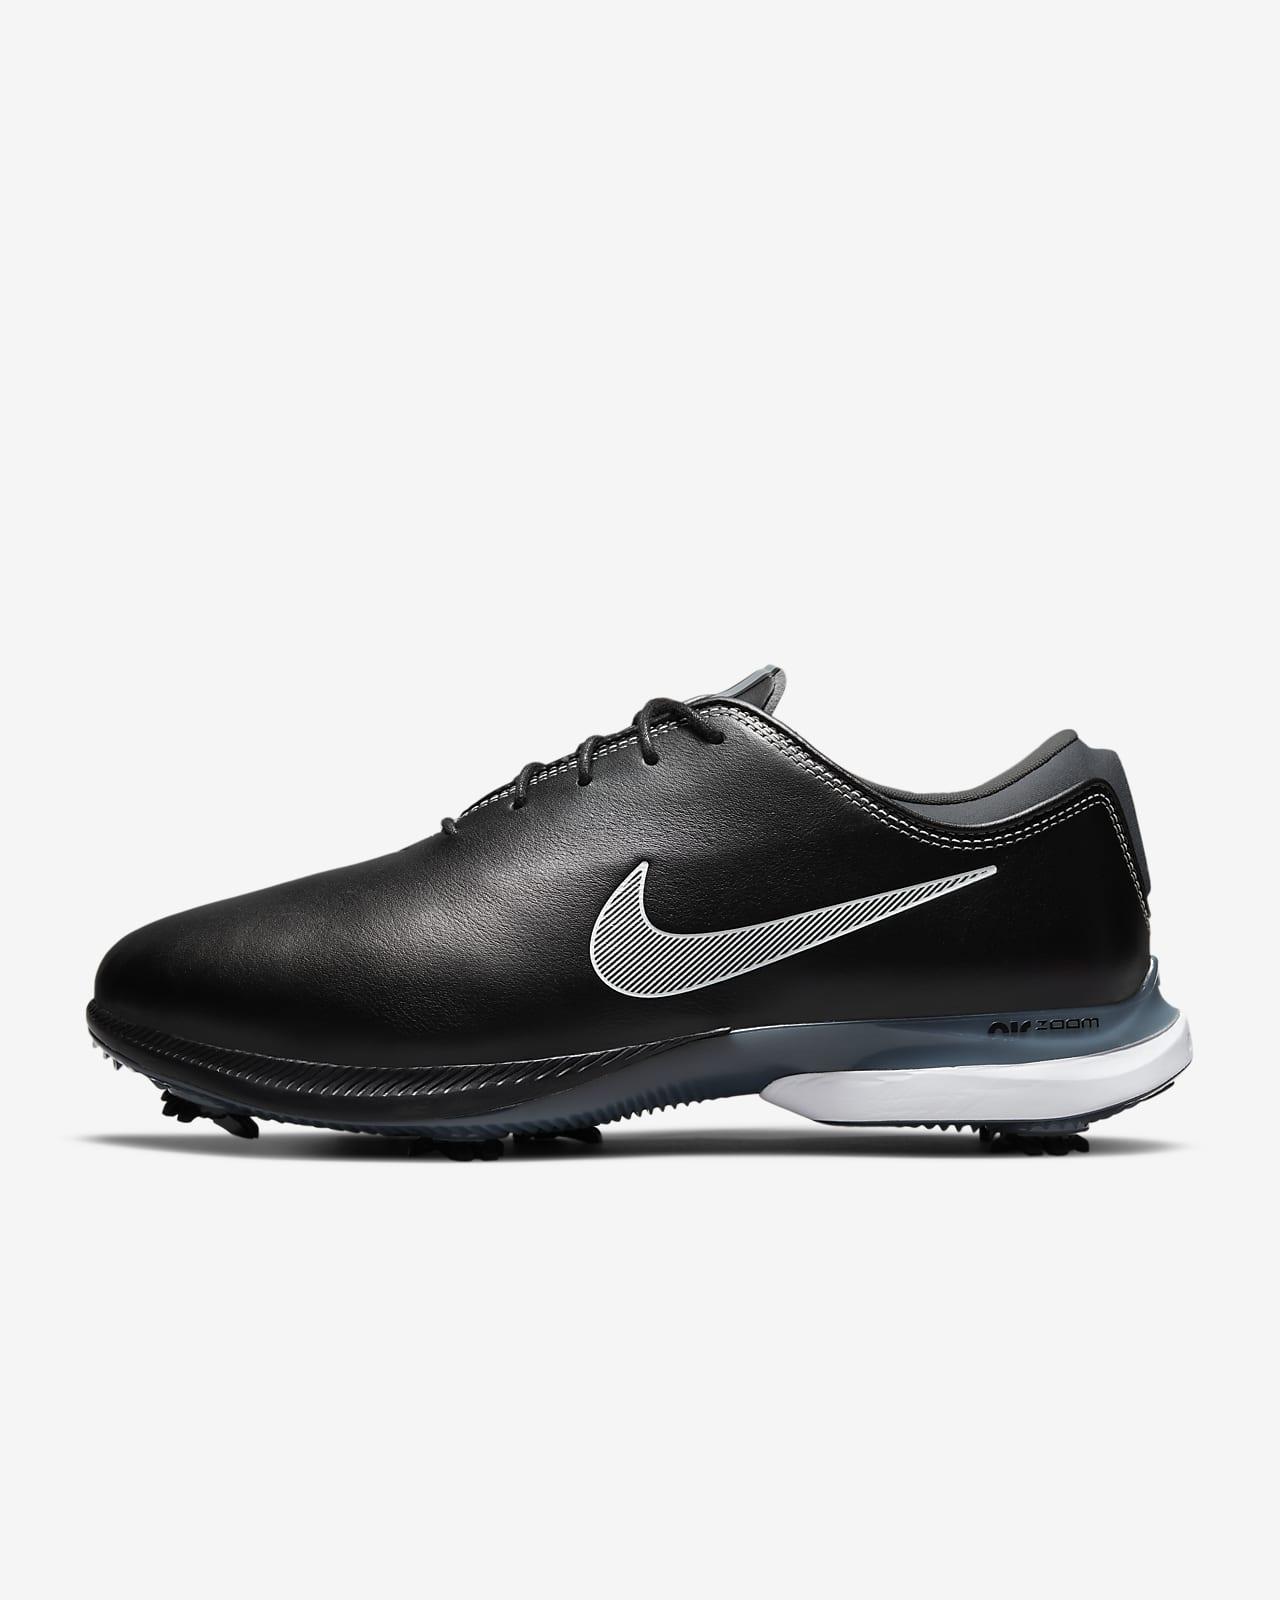 Calzado de golf Nike Air Zoom Victory Tour 2 (ancho)